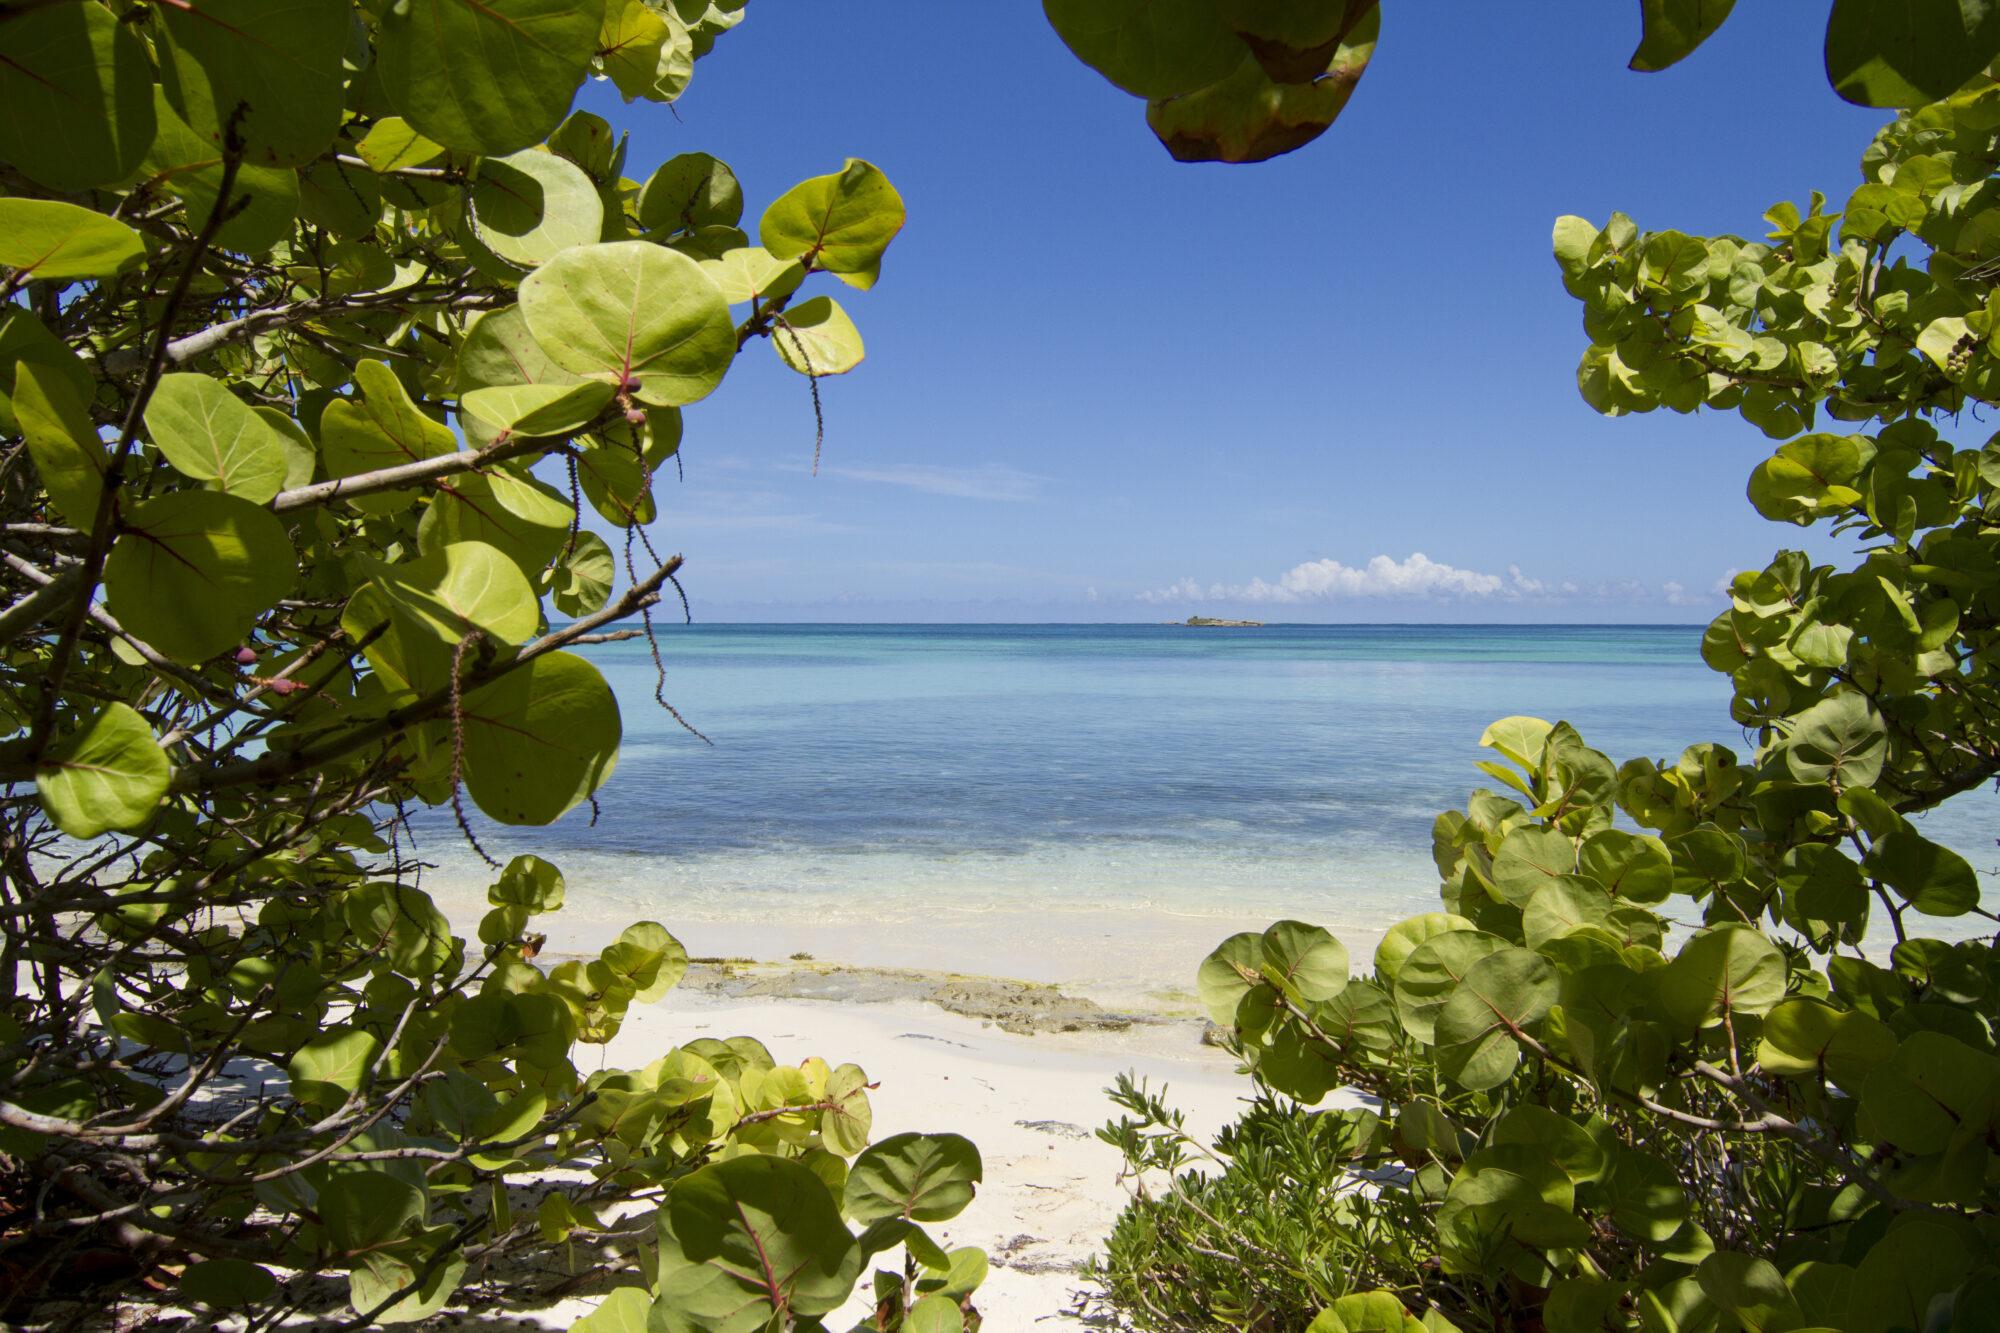 sneak-peek-at-green-island1